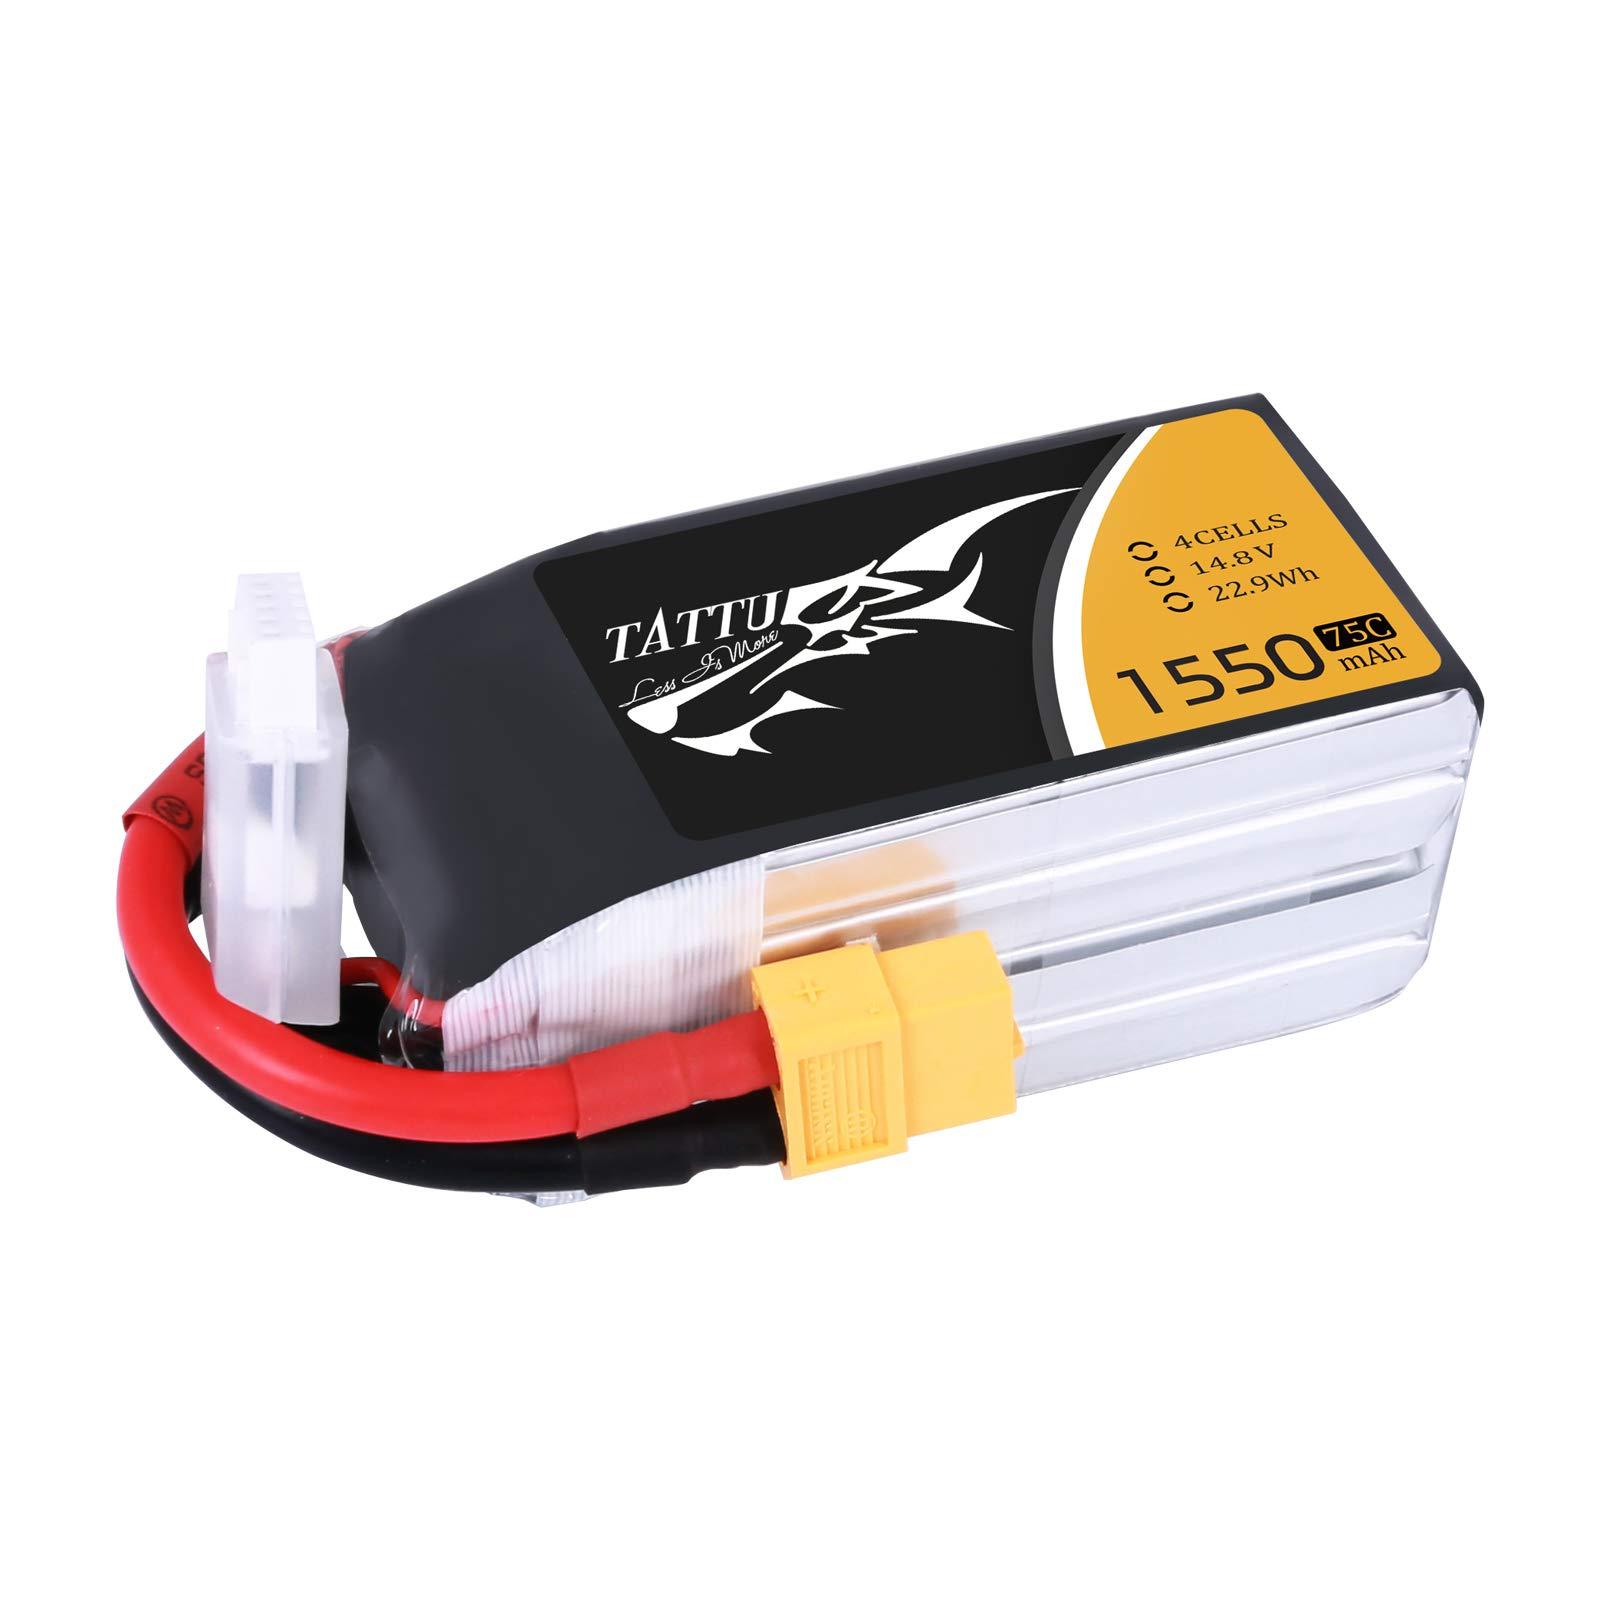 Tattu LiPo Battery Pack 1550mAh 75C 4S 14.8V with XT60 Plug for RC Boat Heli Airplane UAV Drone FPV